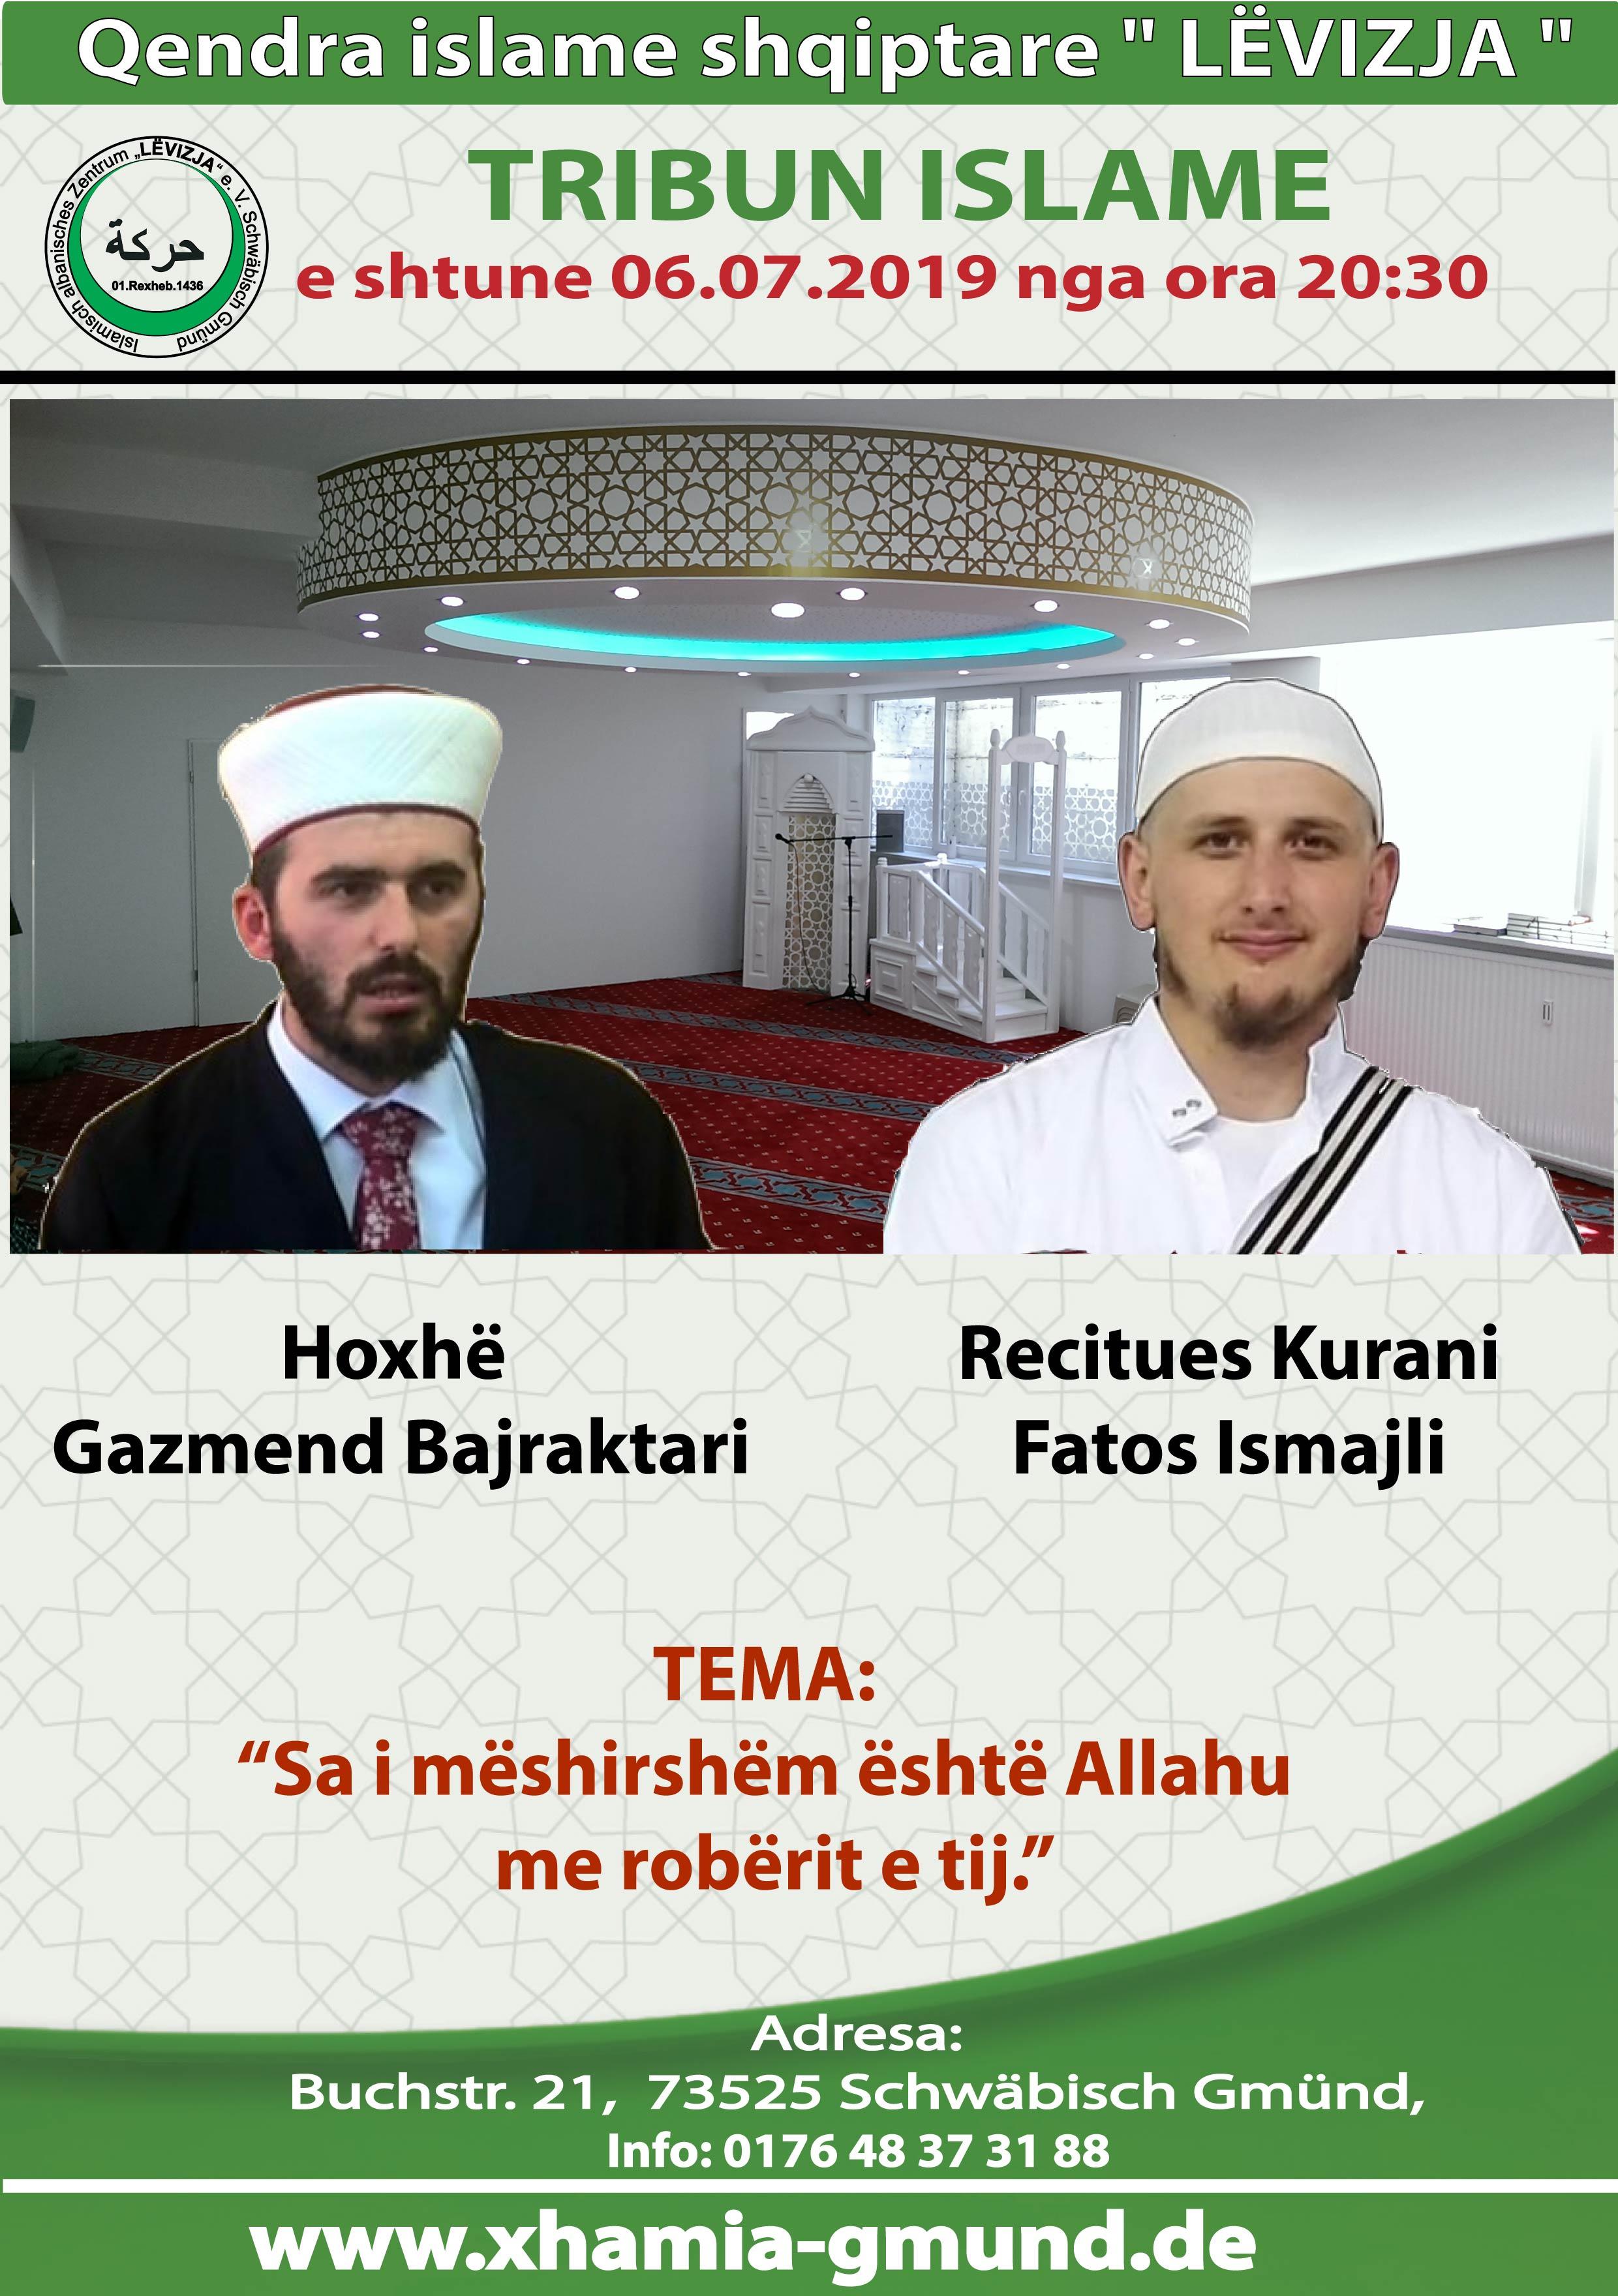 Tribun me Gazmir Bajraktani dhe Fatos ismaili 06.07.2019.